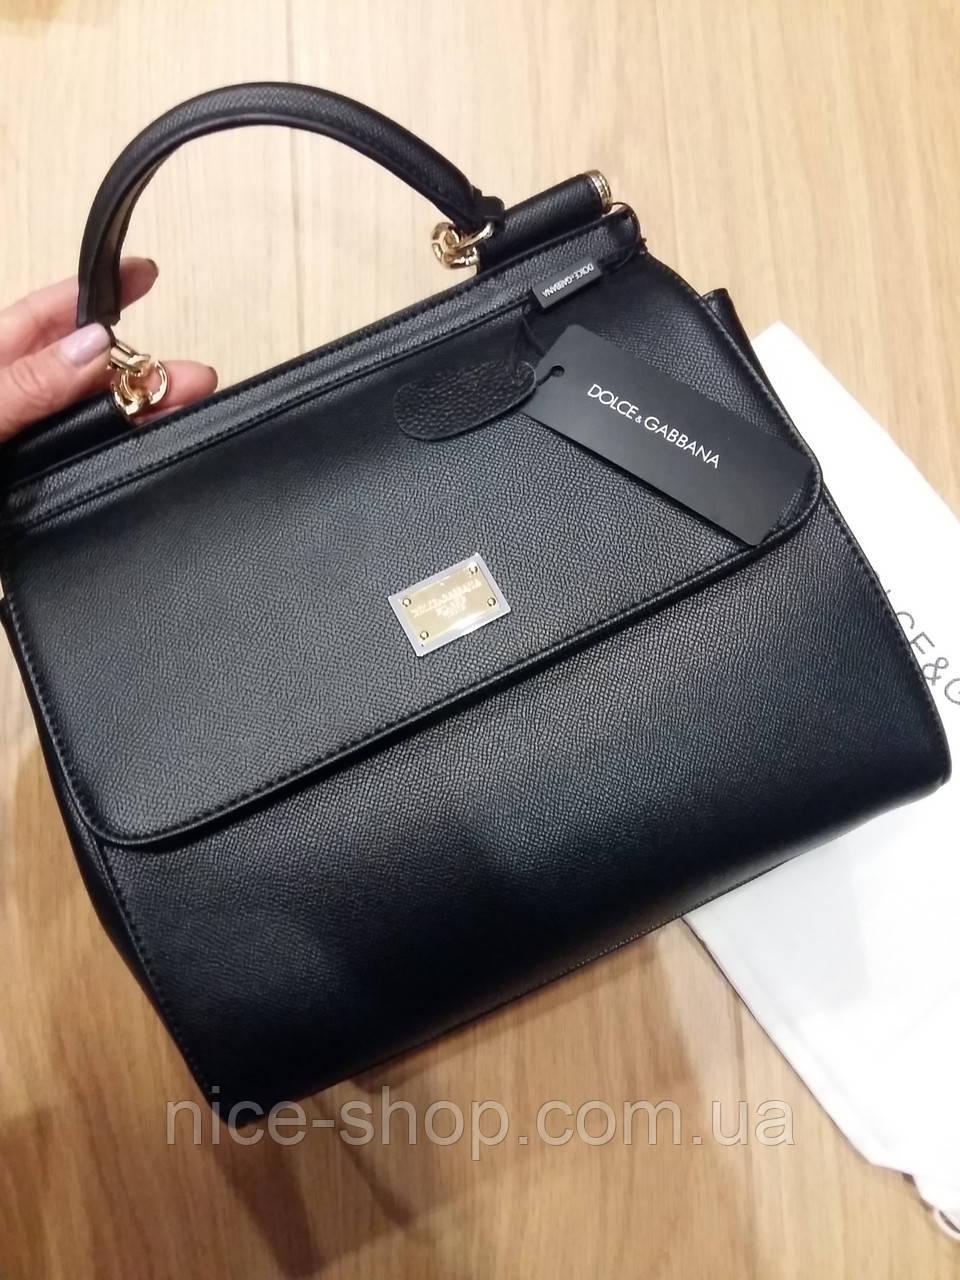 Люкс-реплика сумка Dolce&Gabbana, макси